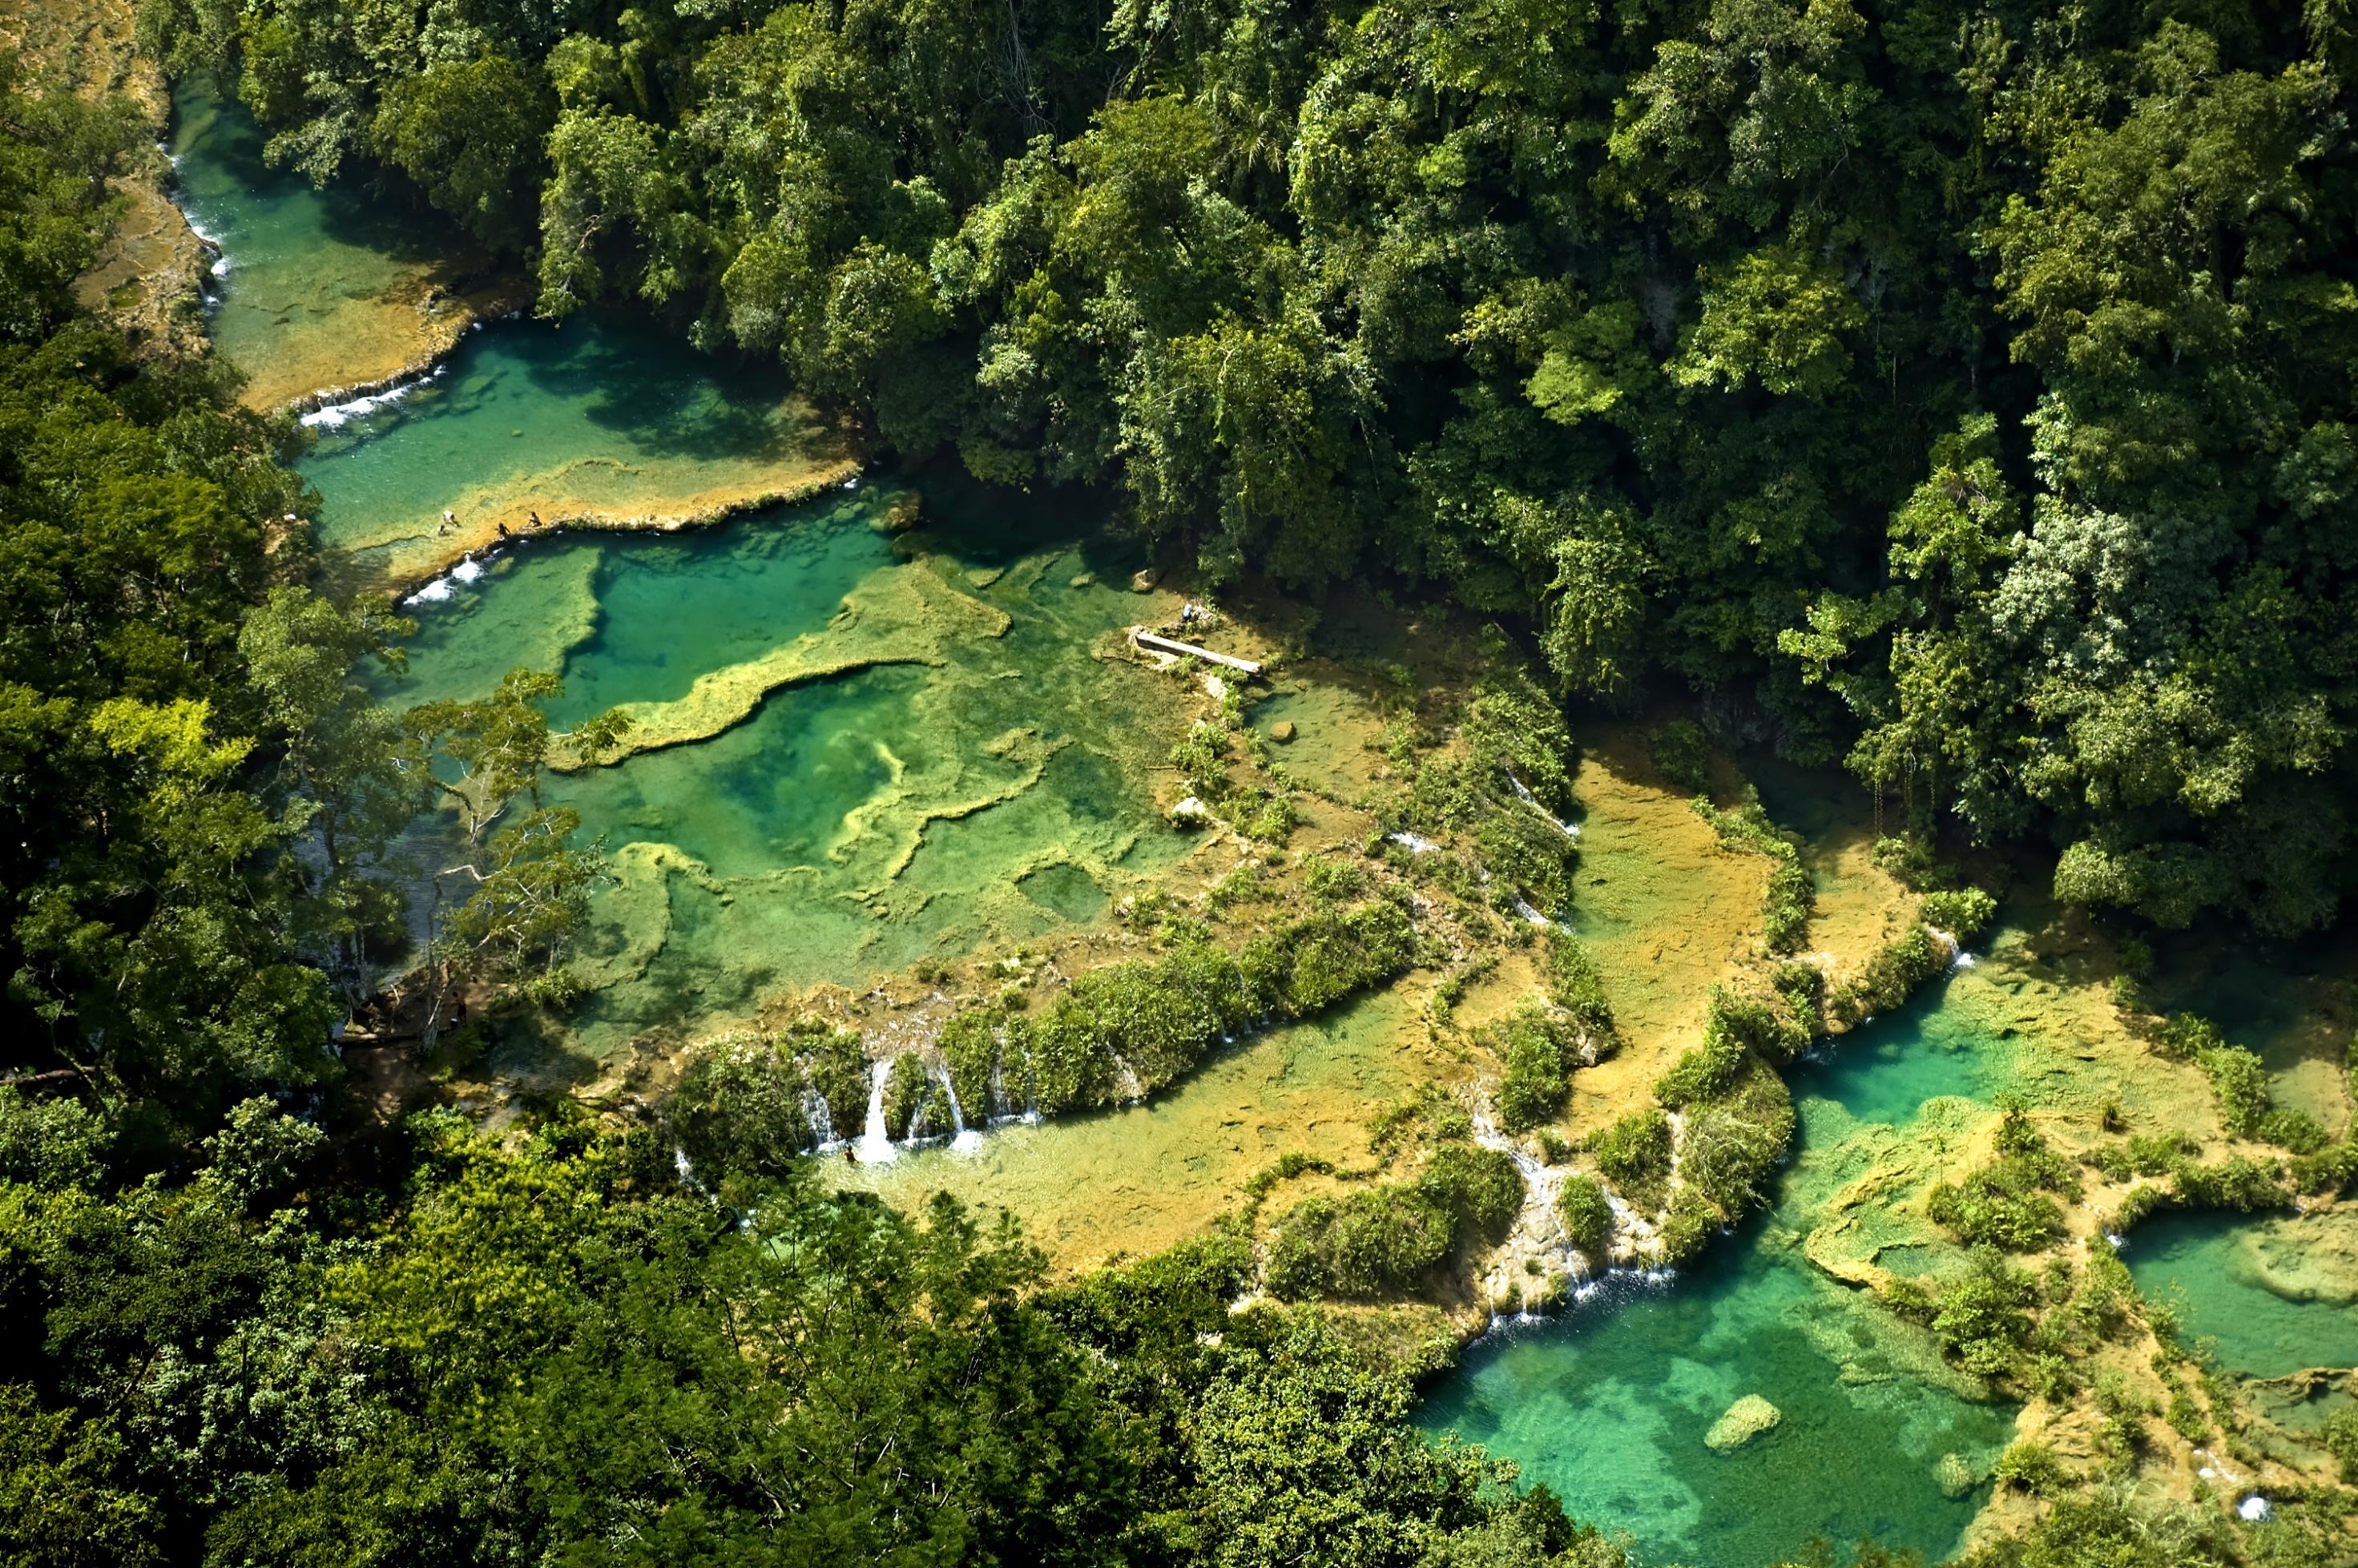 Nom : Semuc Champey PVT Guatemala.jpg Affichages : 144 Taille : 2,90 Mo